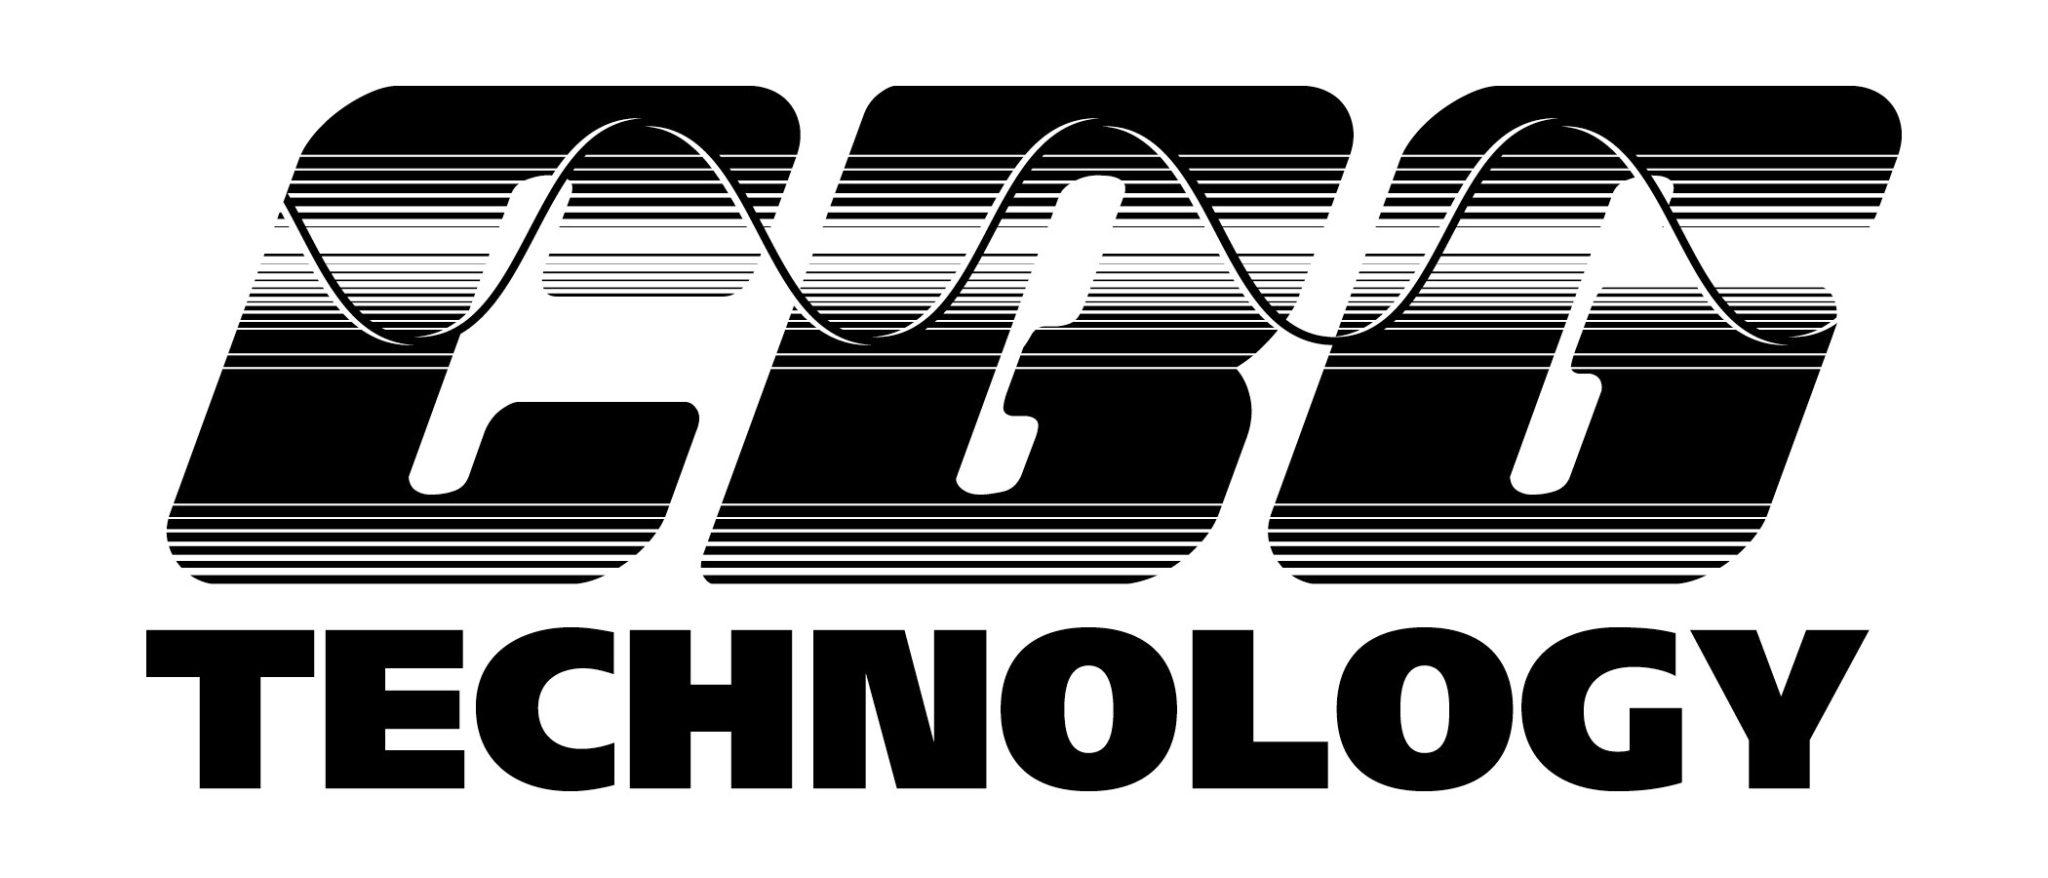 CBG Technology